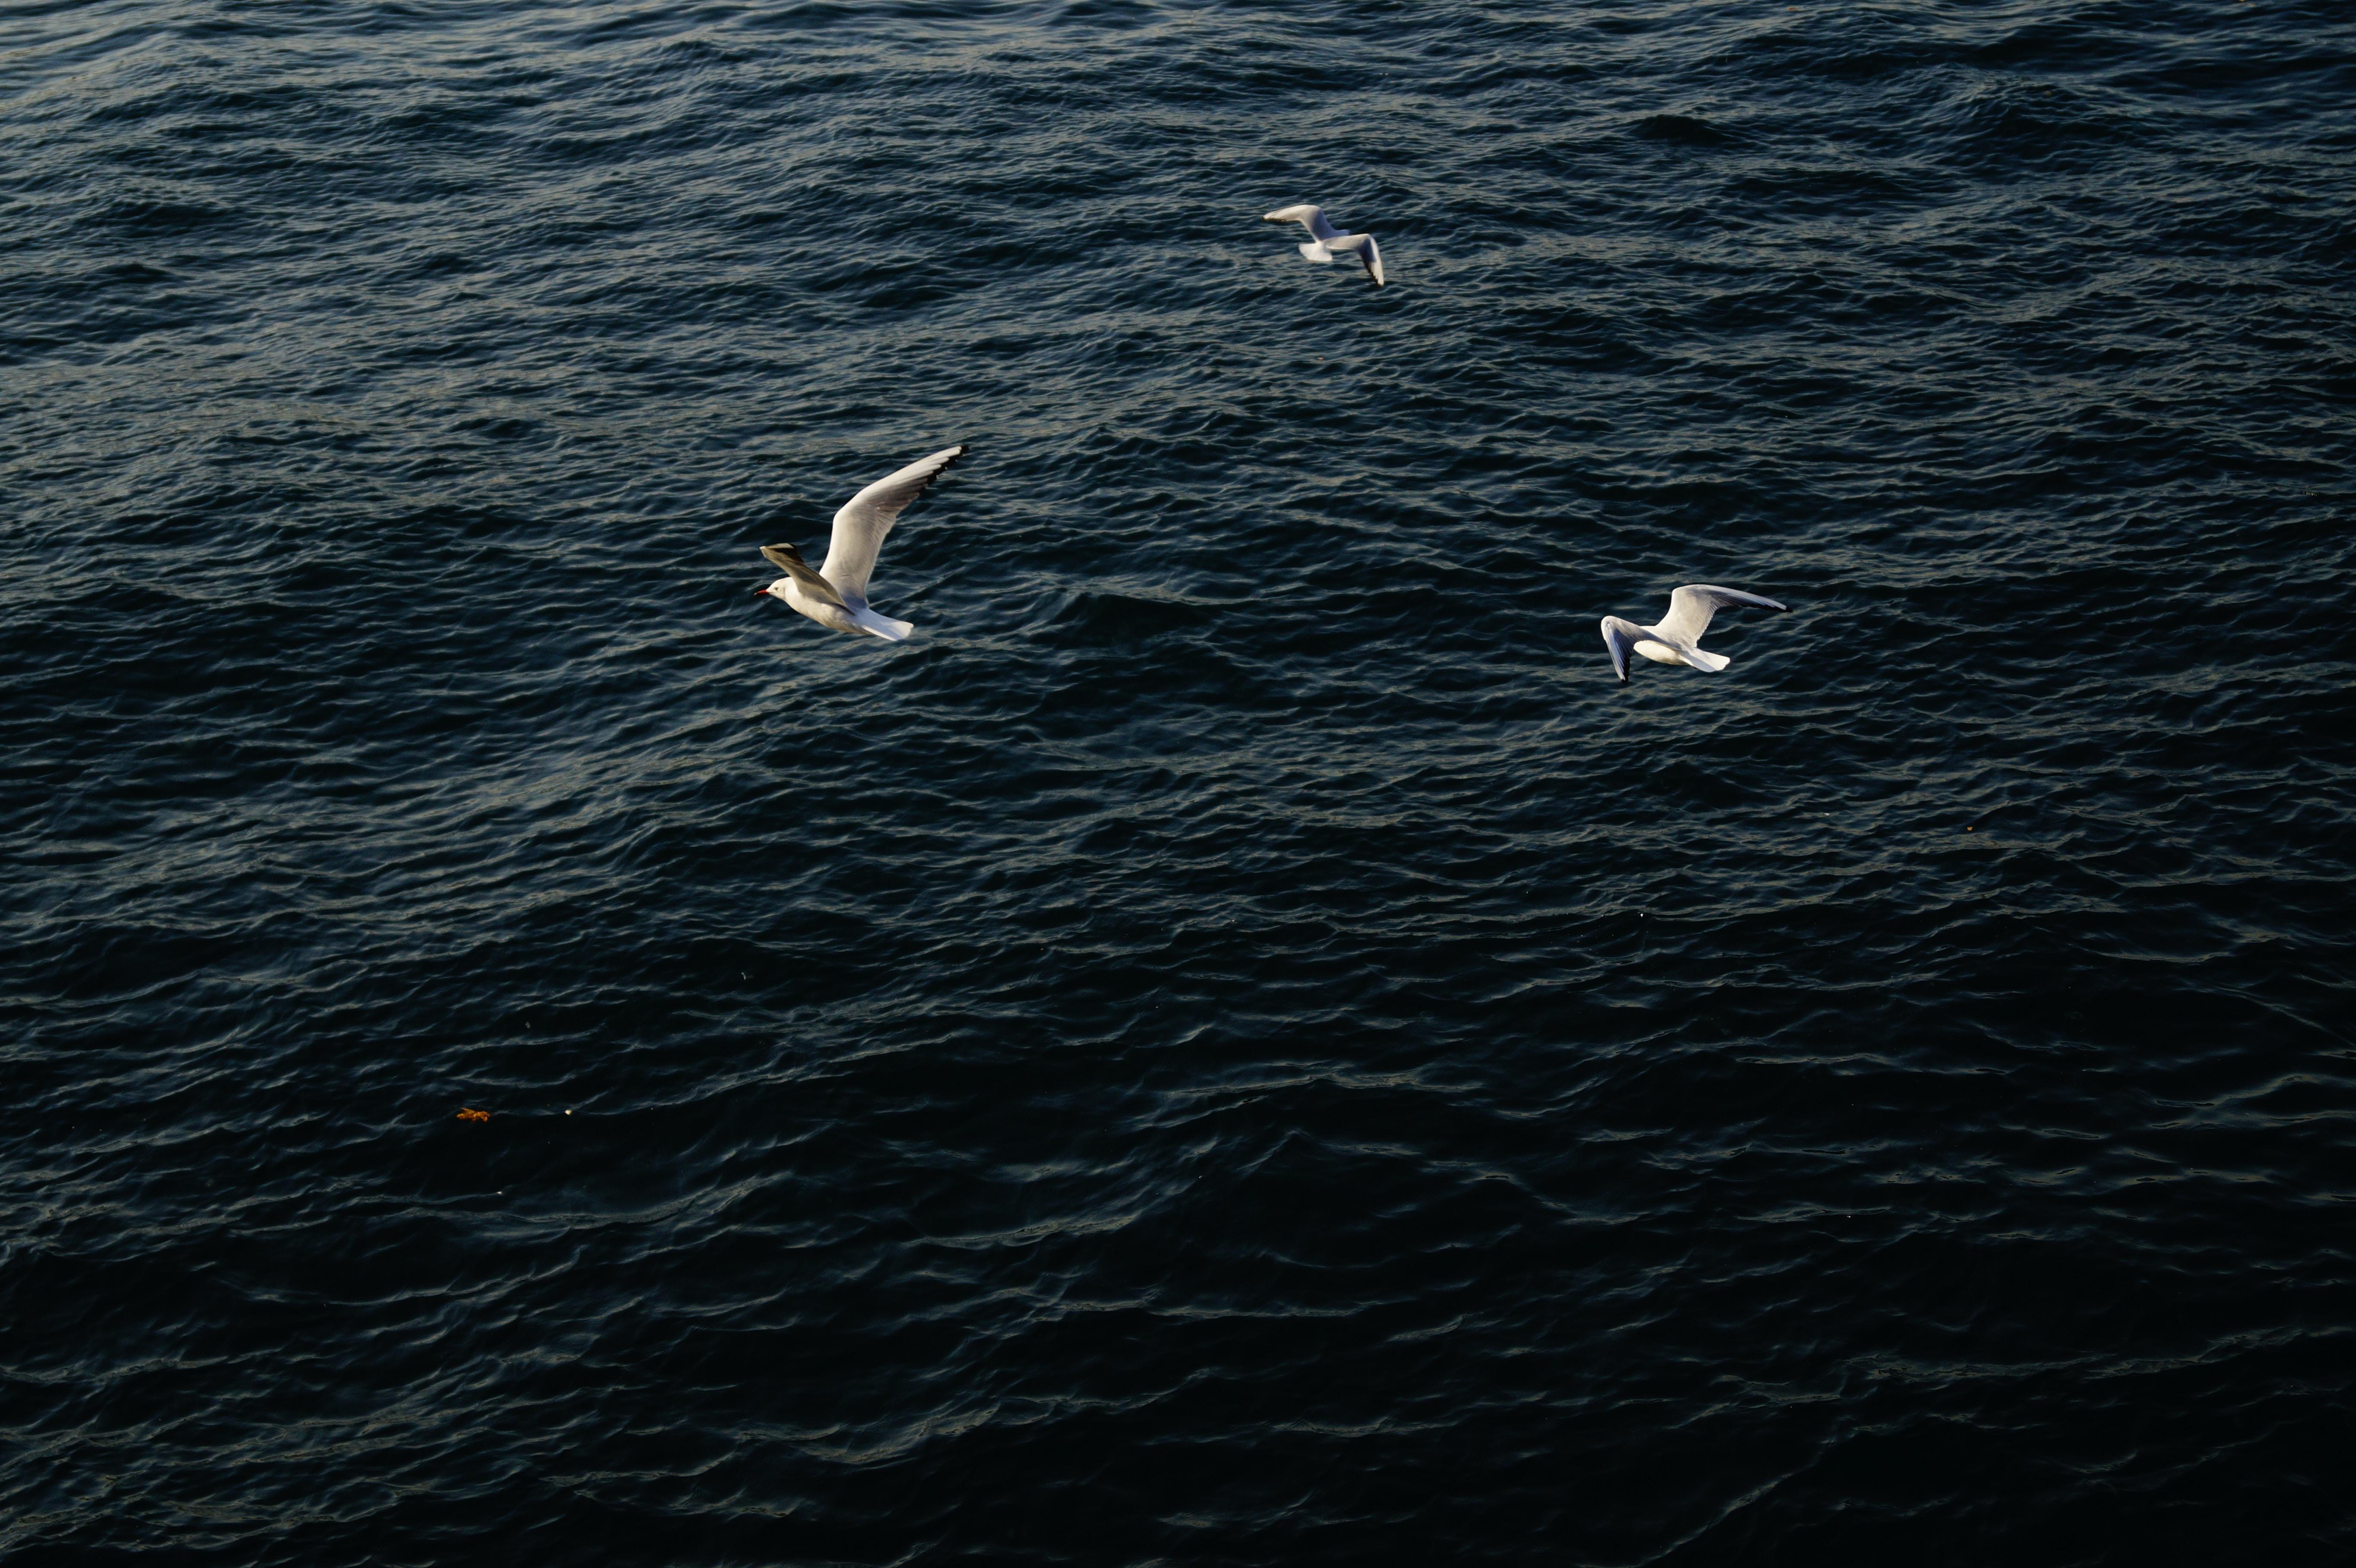 three white birds on flight above clear blue sea